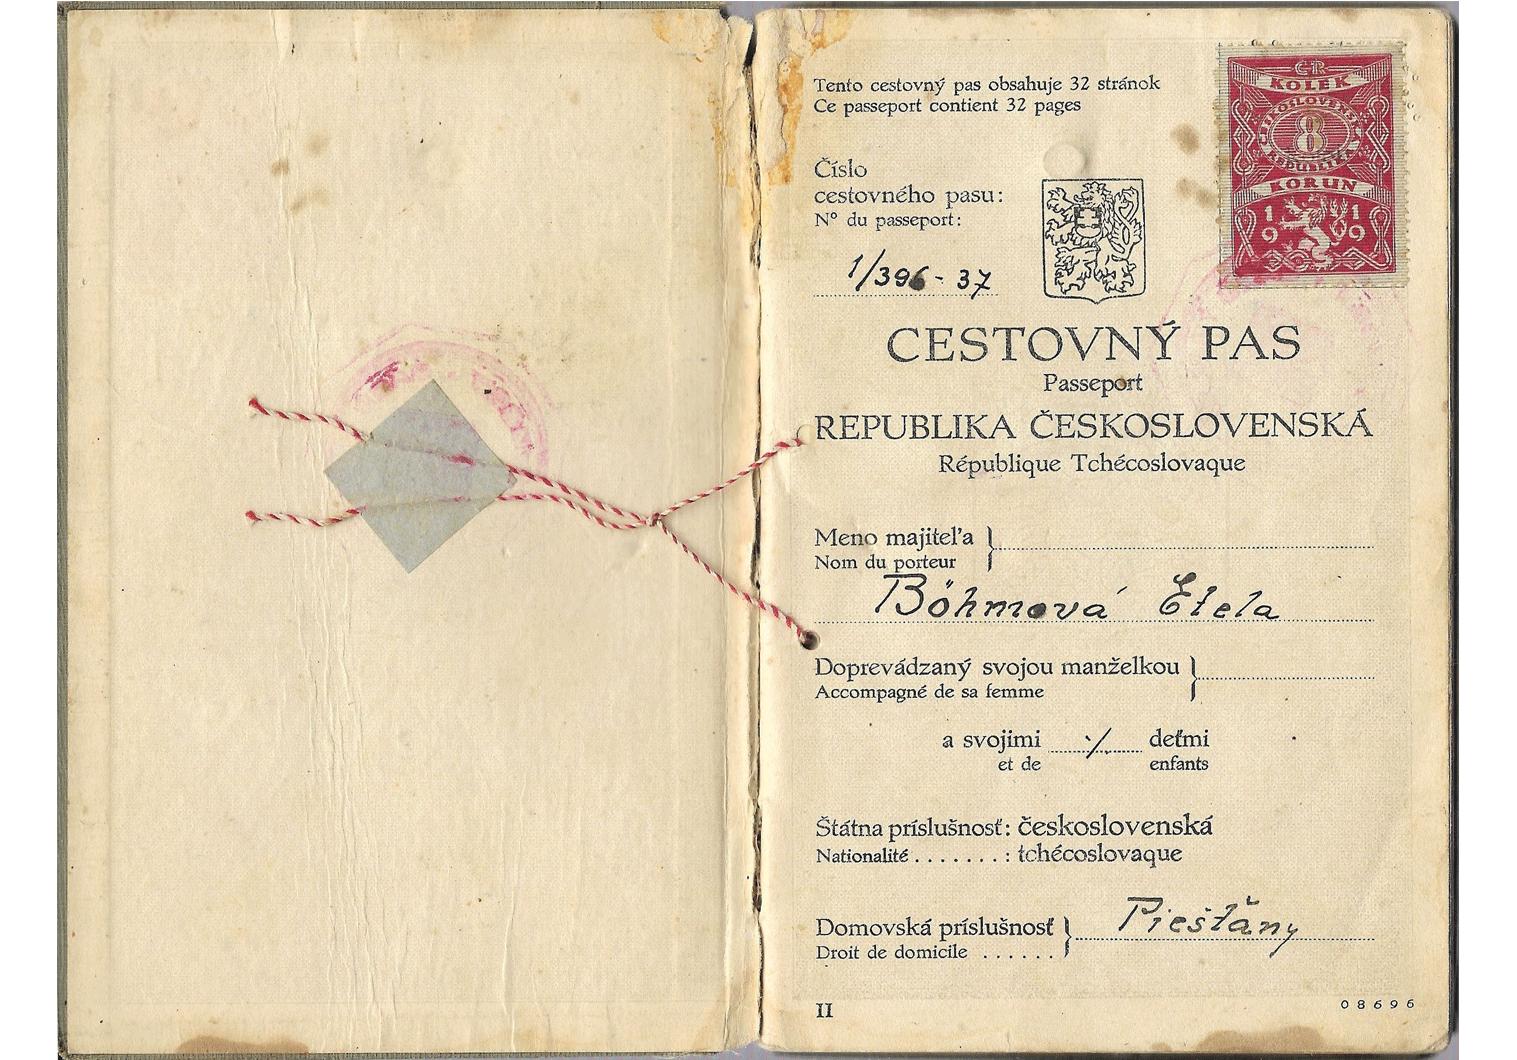 WW2 refugee passport